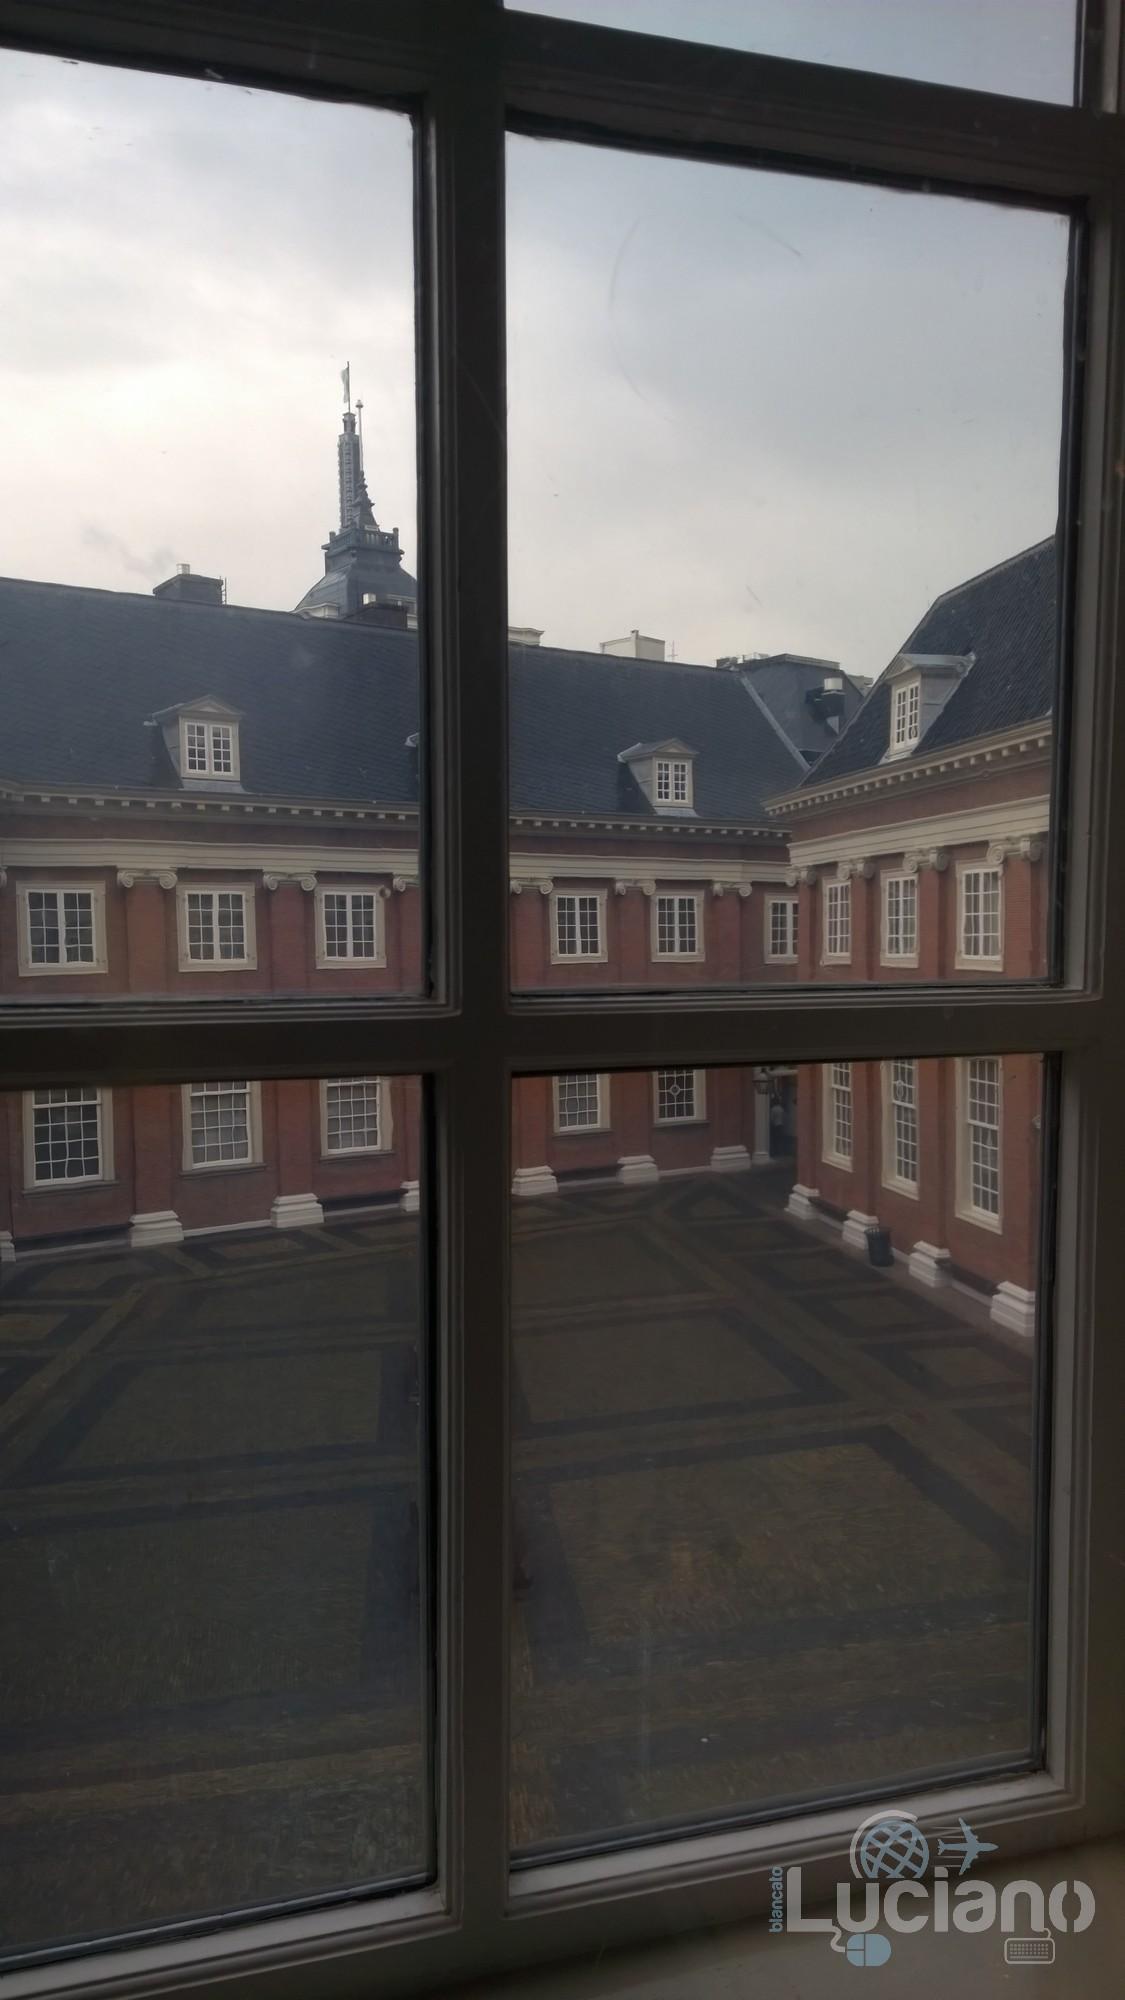 amsterdam-2014-vueling-lucianoblancatoit (134)